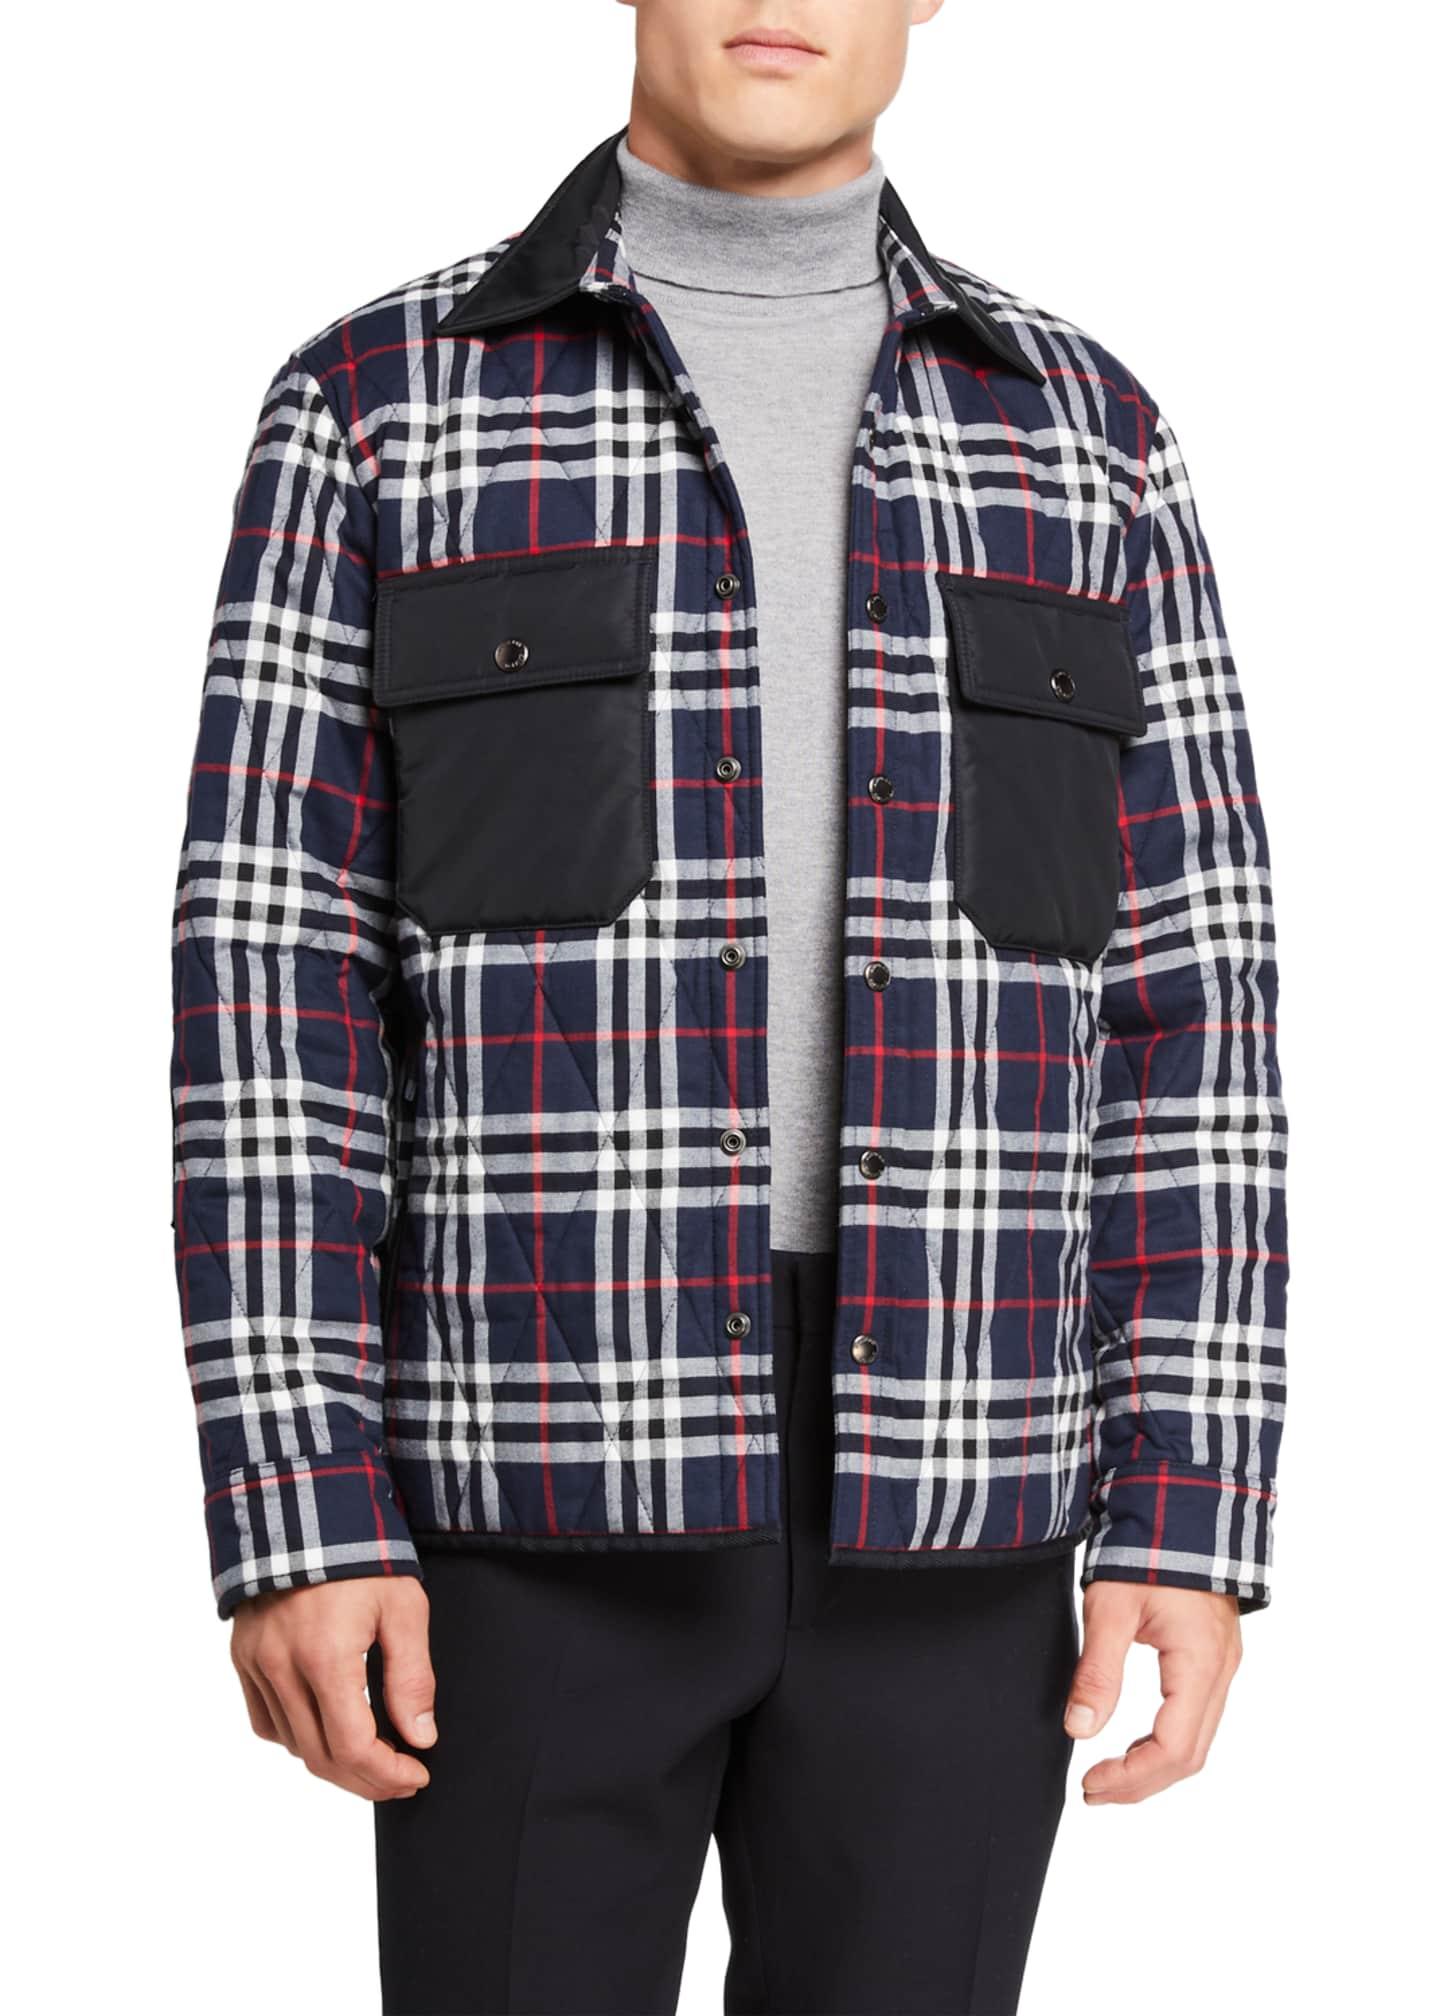 Burberry Men's Billington Check Quilted Shirt Jacket